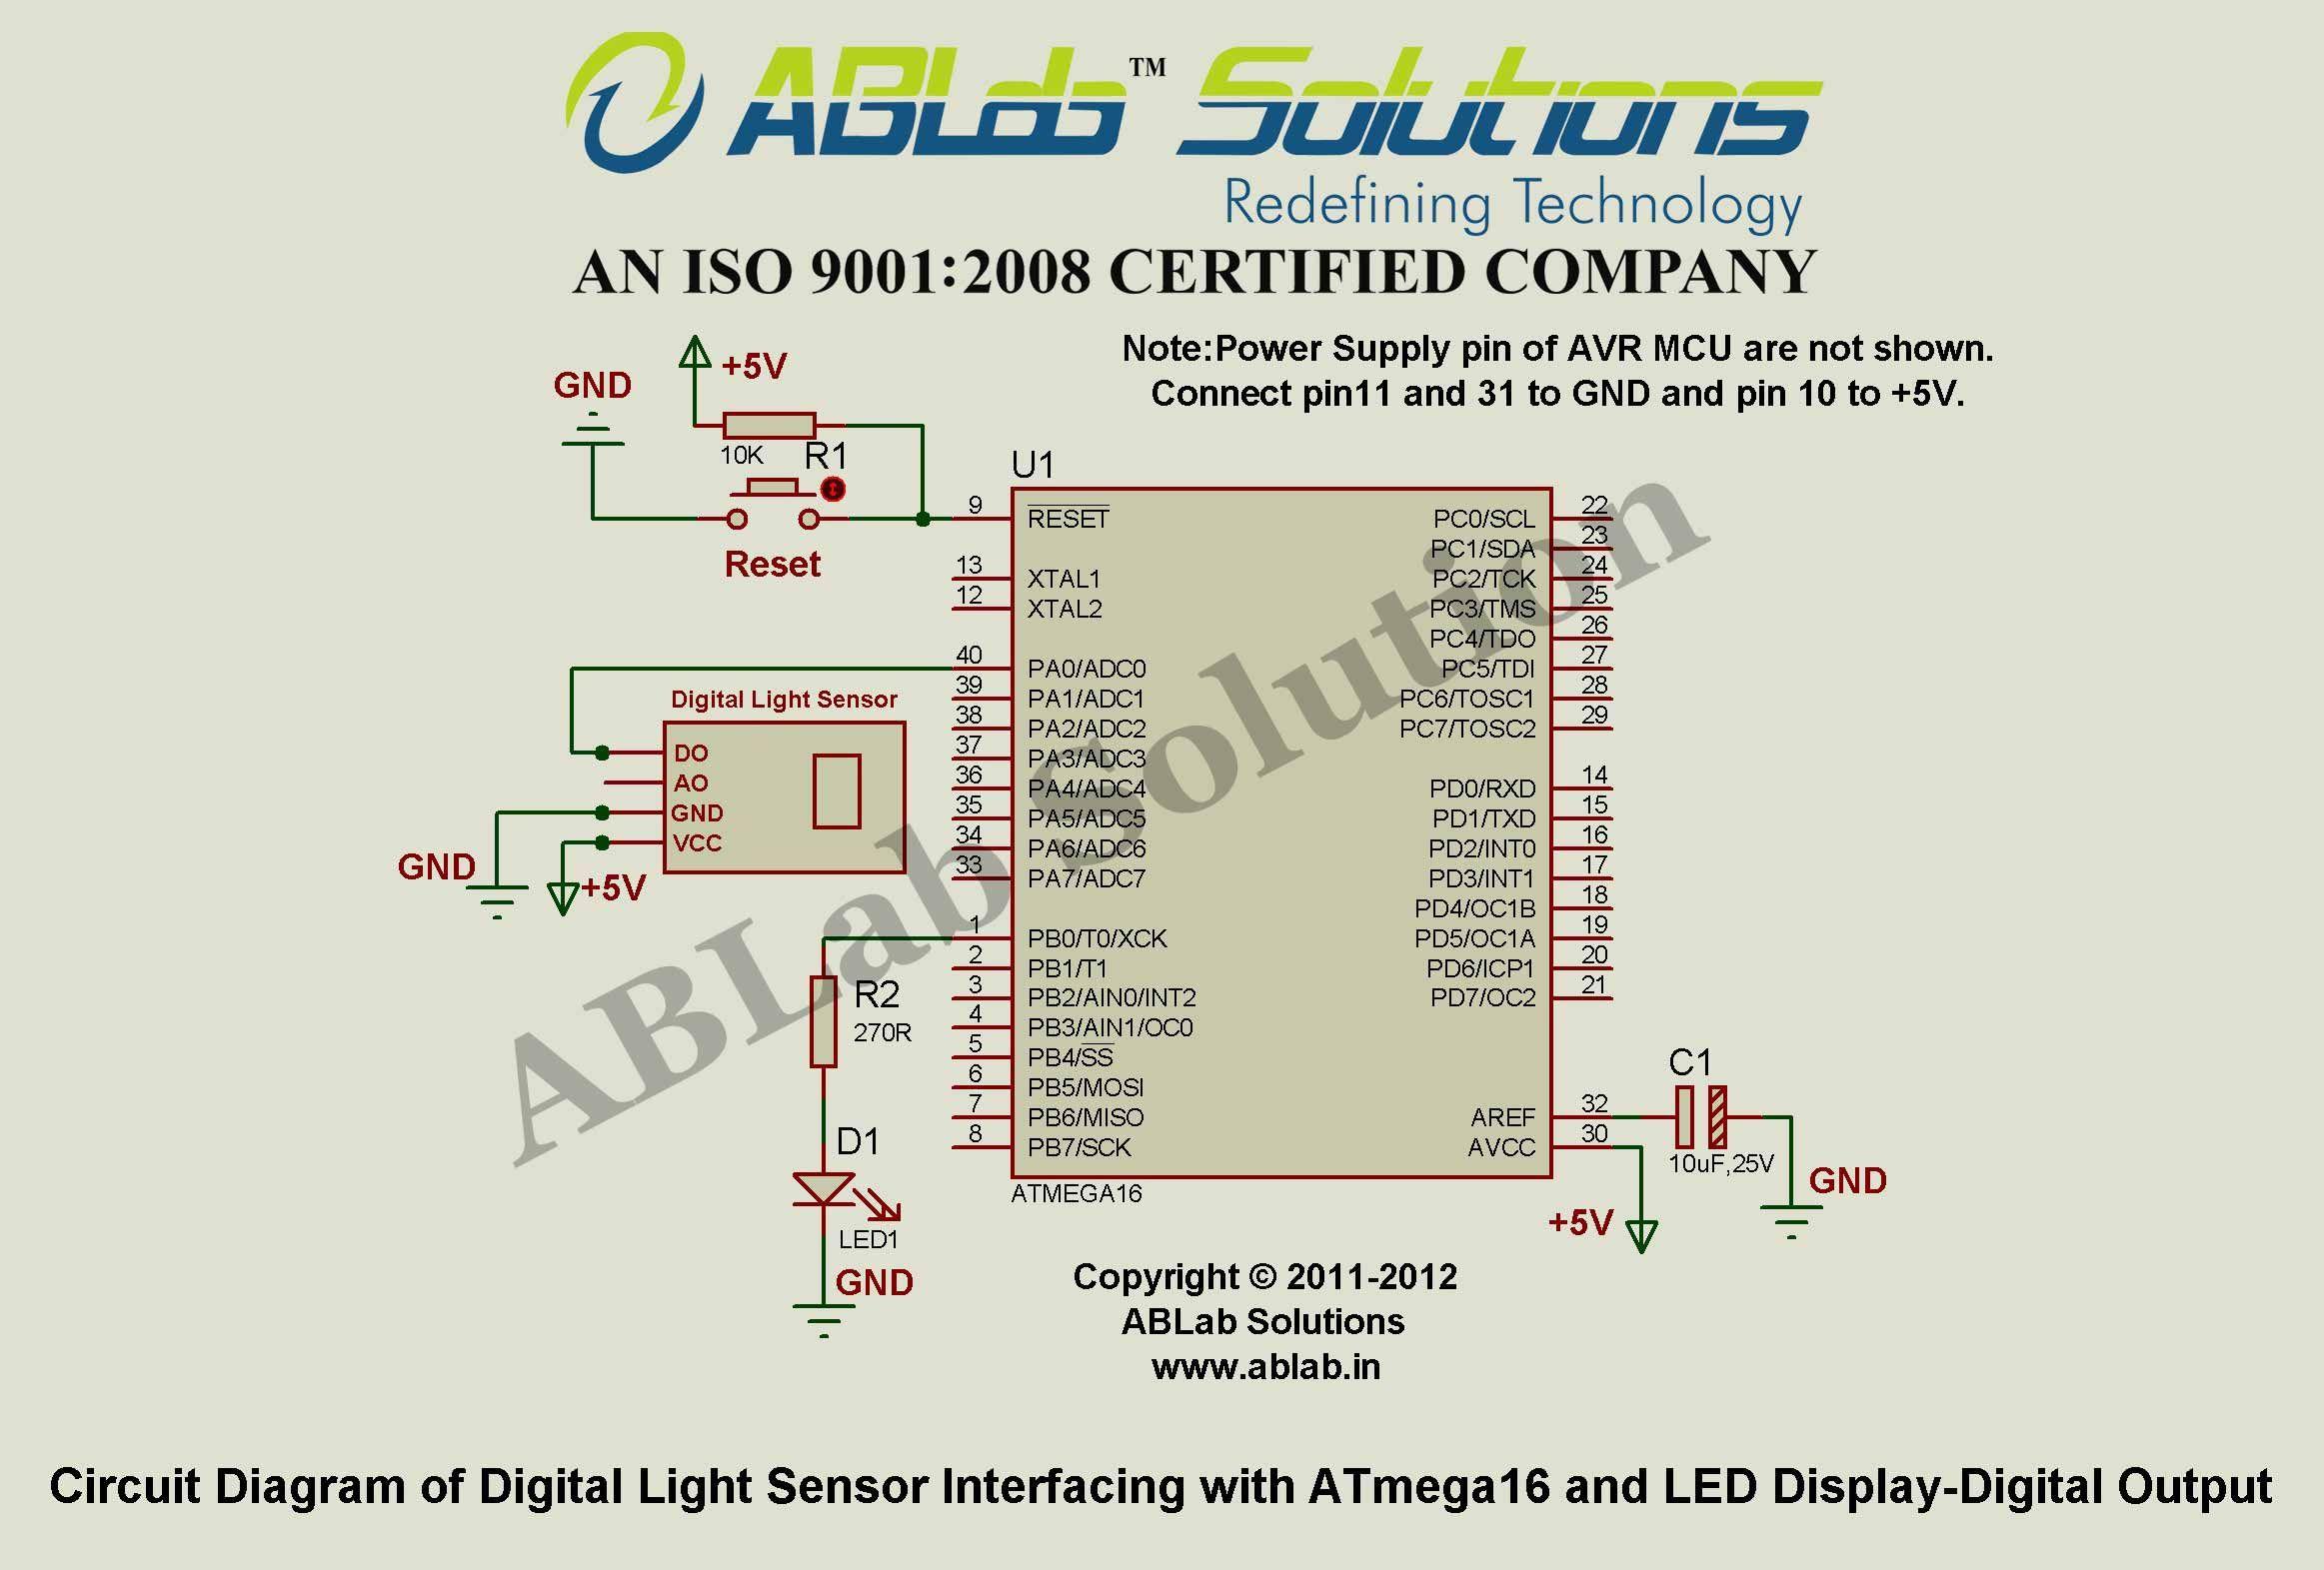 Digital Light Sensor Interfacing With Avr Atmega16 Microcontroller Led Display Circuit Diagram And Output Ablab Solutions